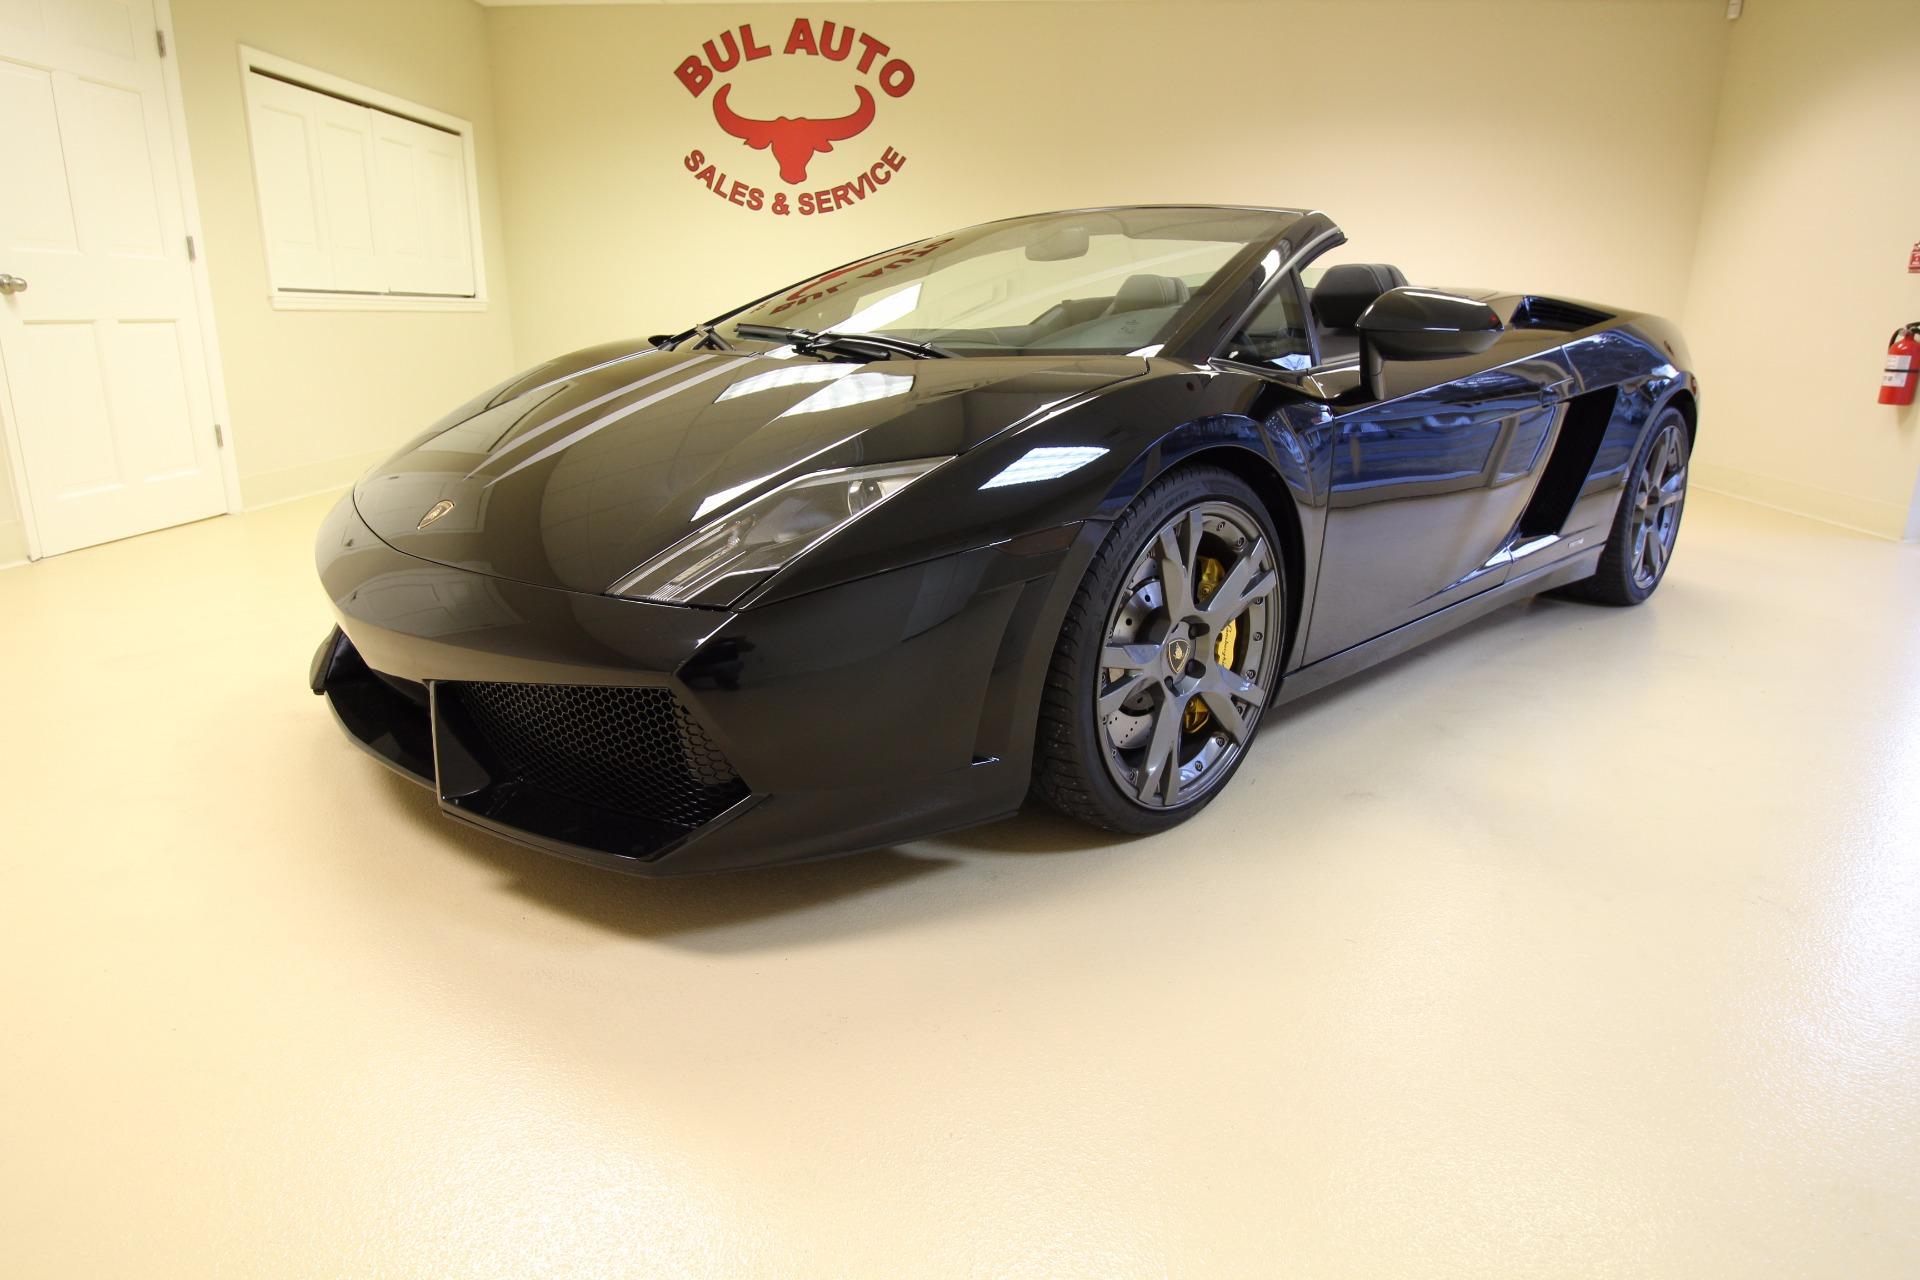 2010 Lamborghini Gallardo Lp560 4 Spyder Stock 17054 For Sale Near